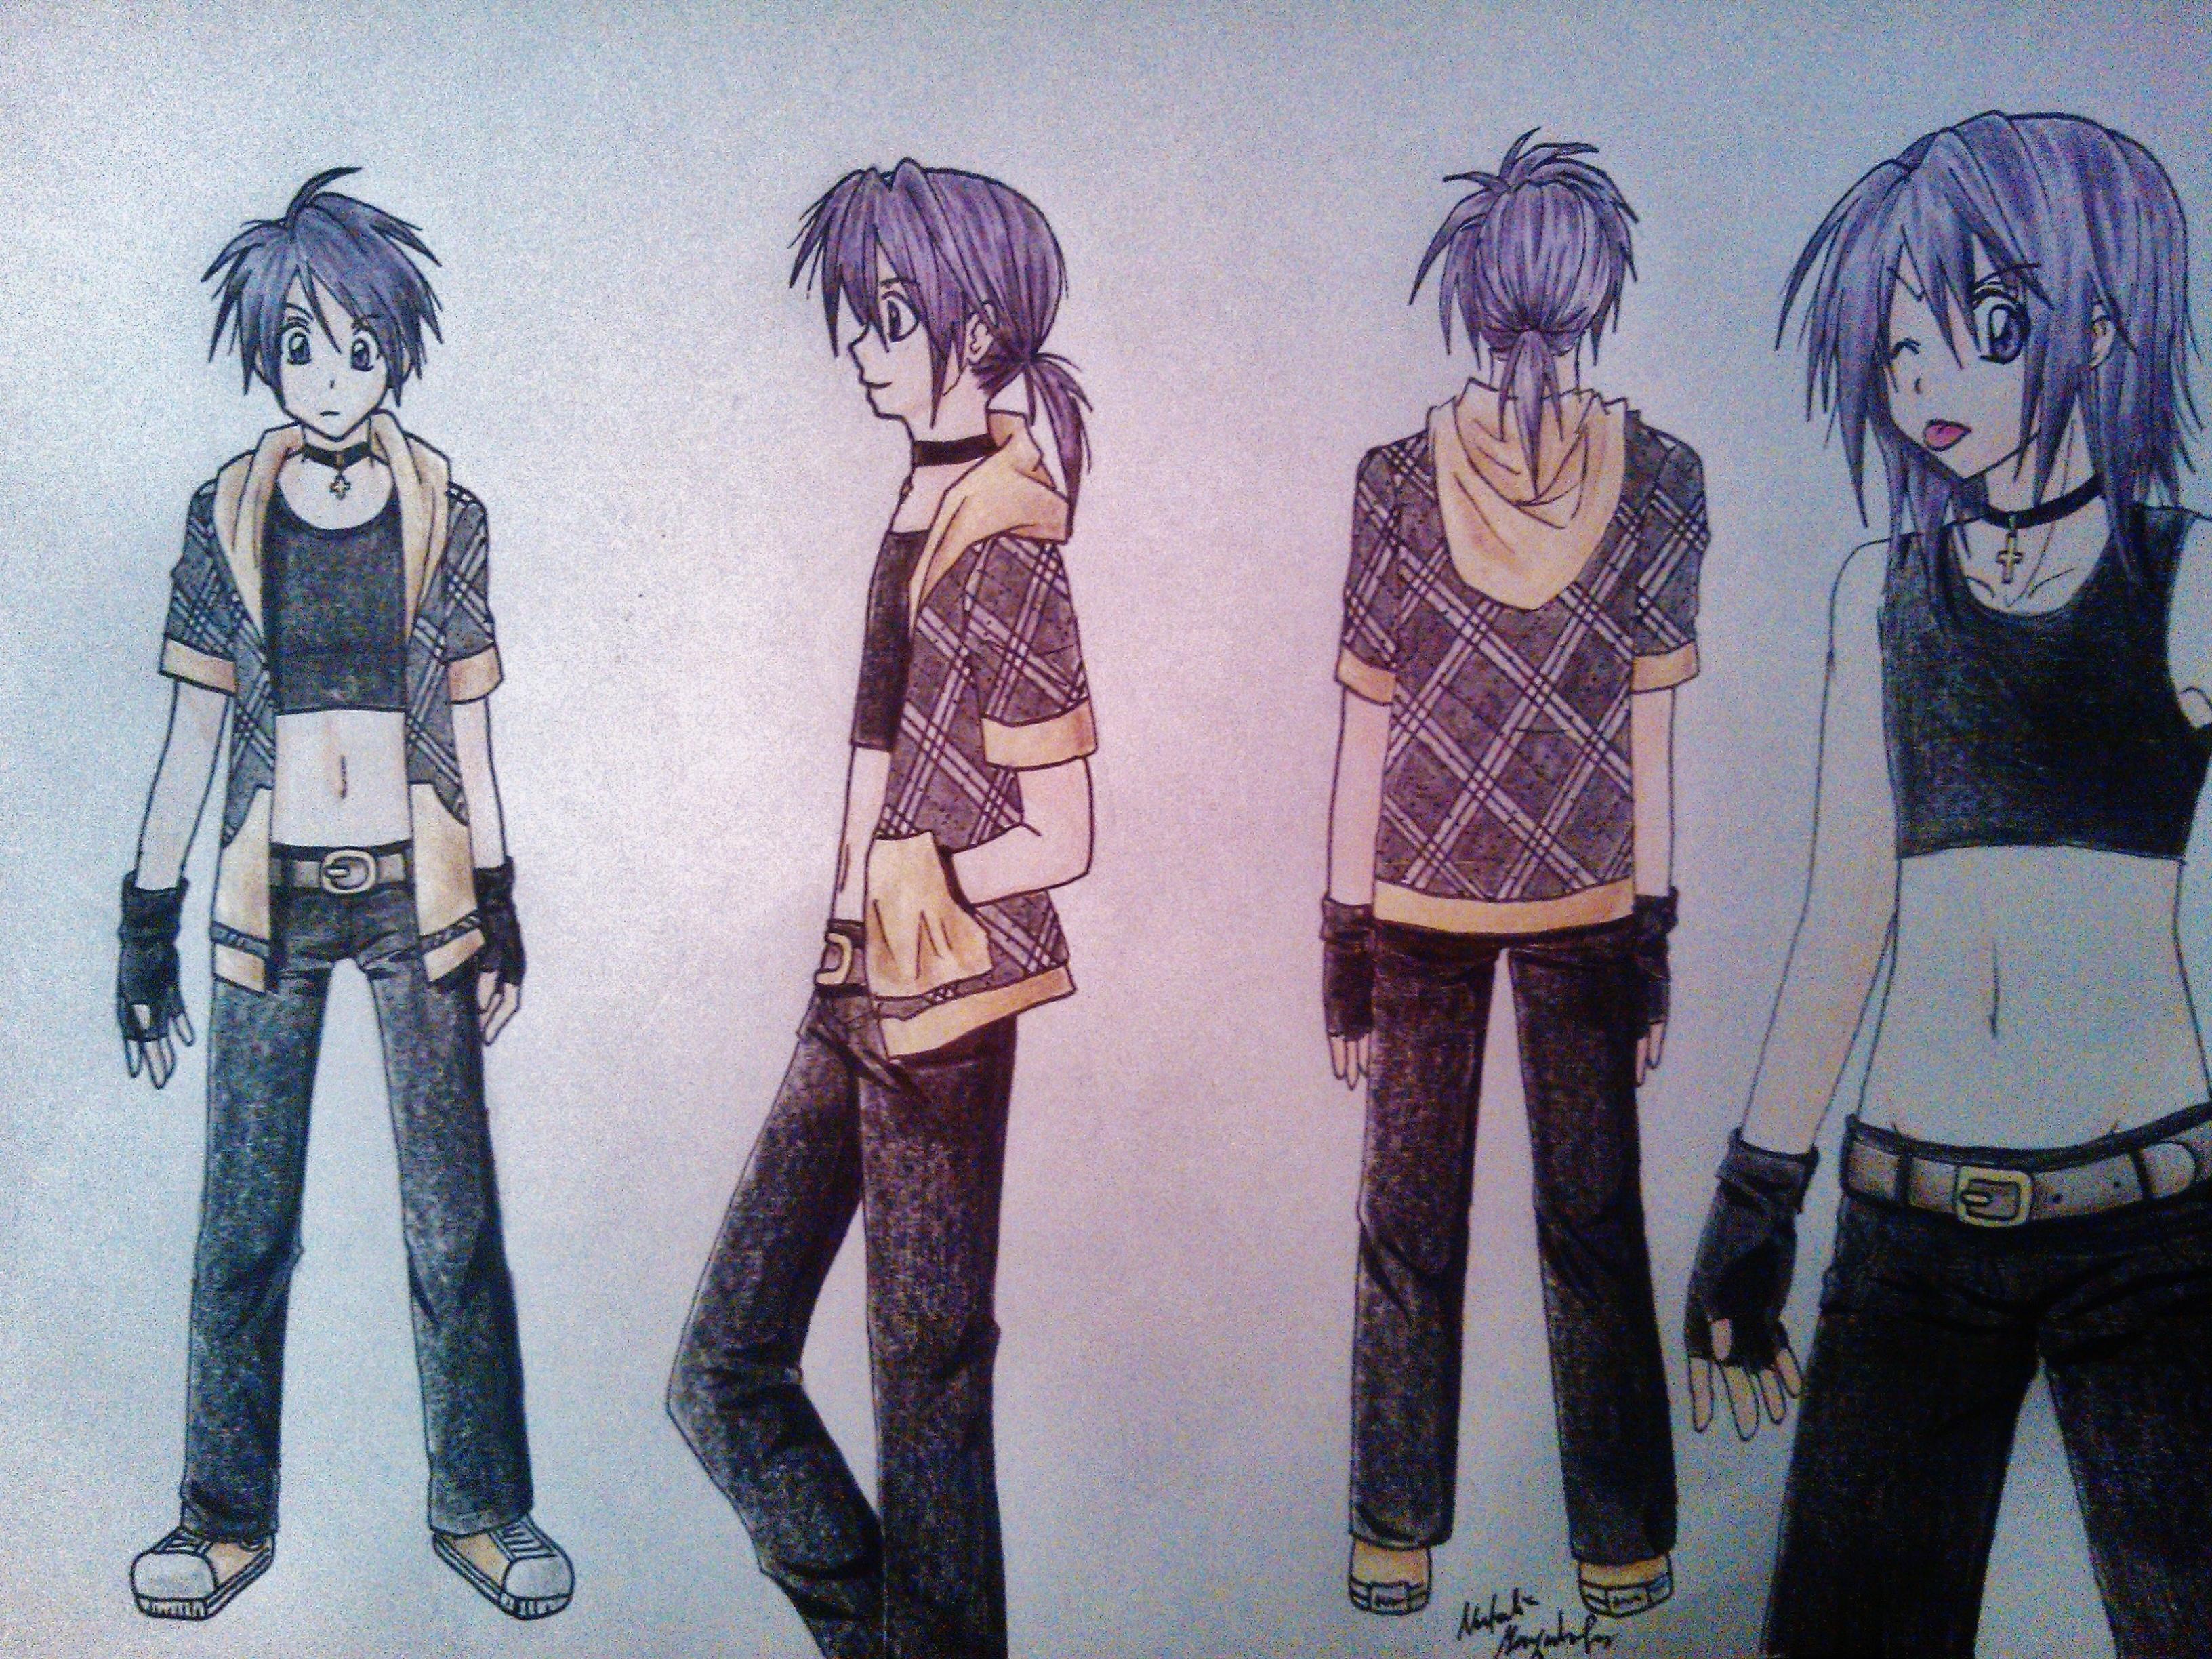 Soul Eater OC Chiaki by Killjoy-Chidori